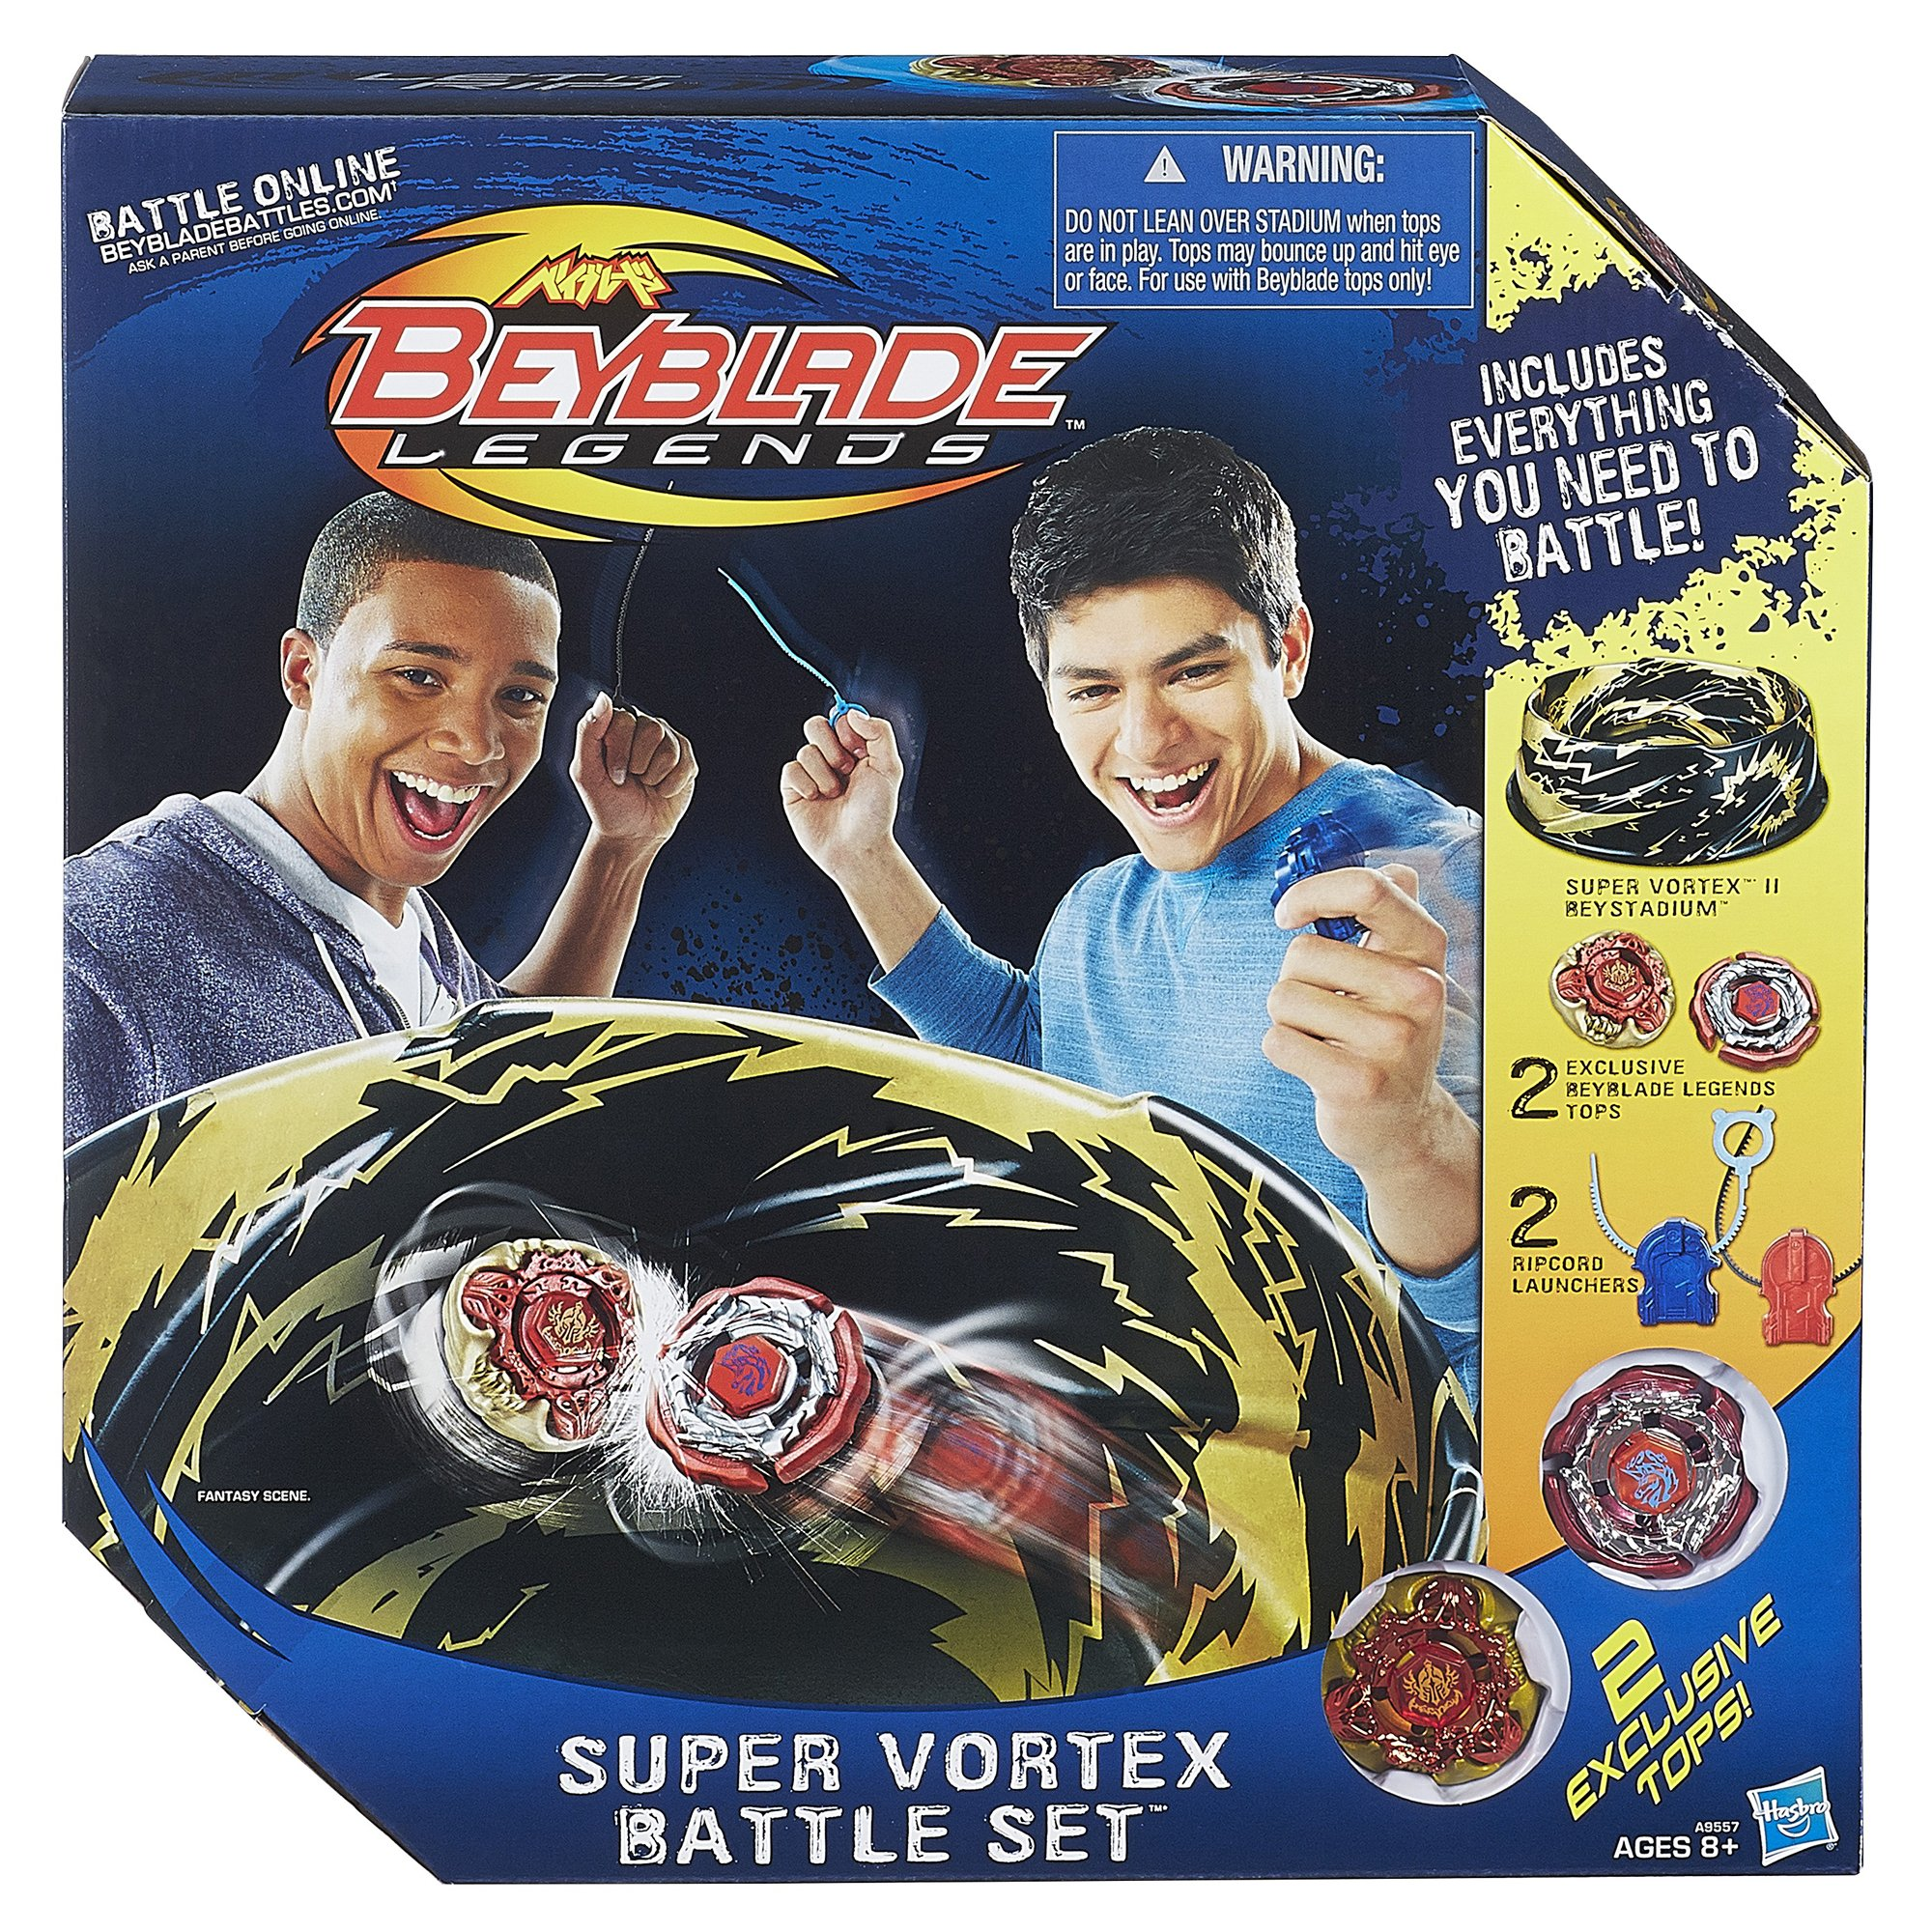 Beyblade Super Vortex Battle Set(Discontinued by manufacturer) by BEYBLADE (Image #1)